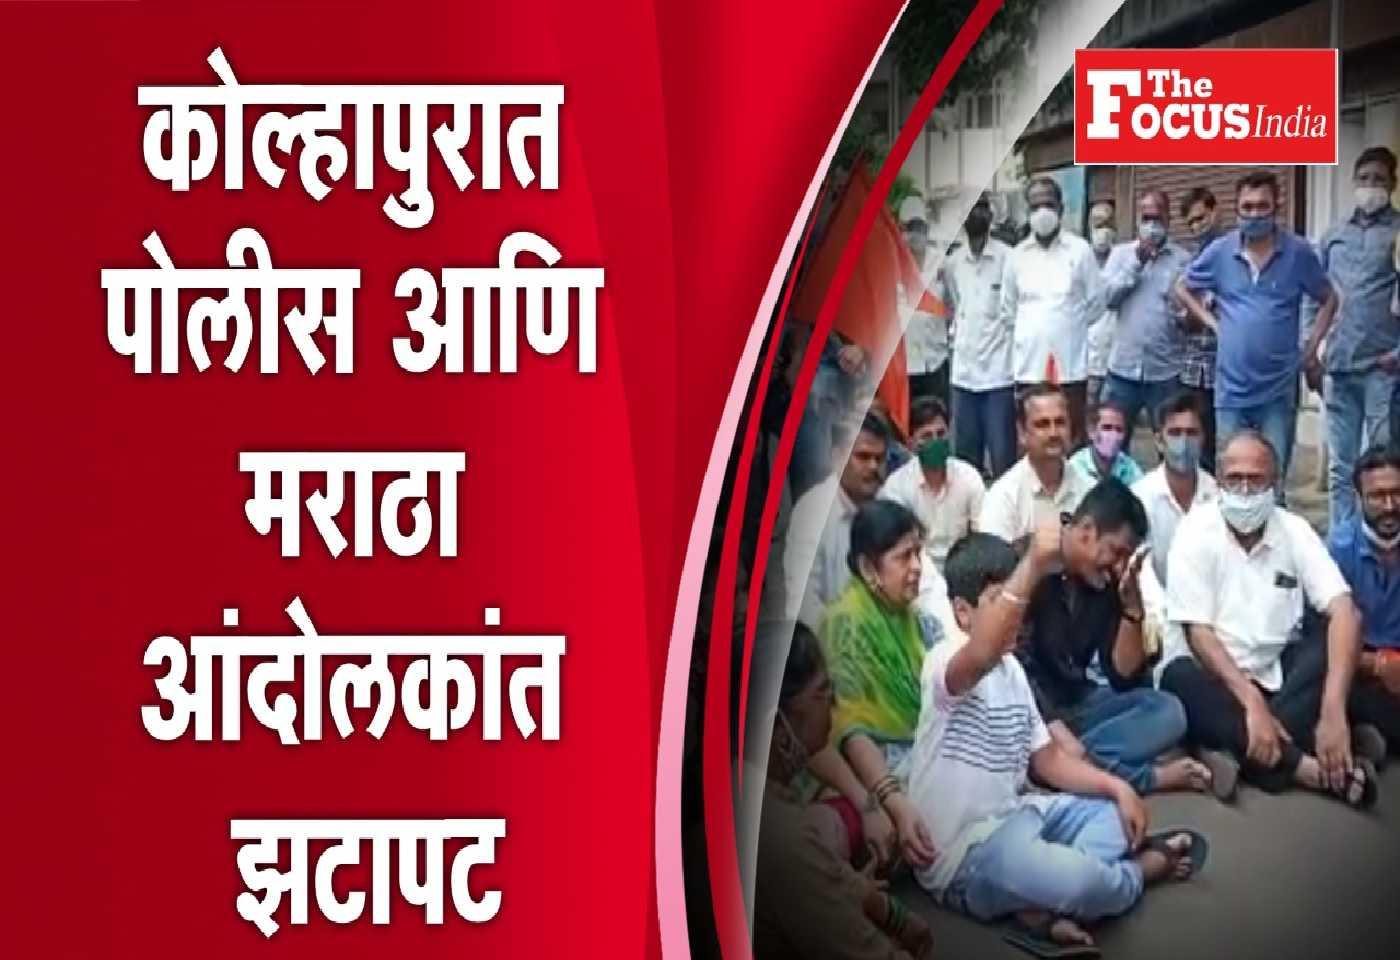 WATCH Fight Between Maratha Morcha Agitators And Police in Kolhapur